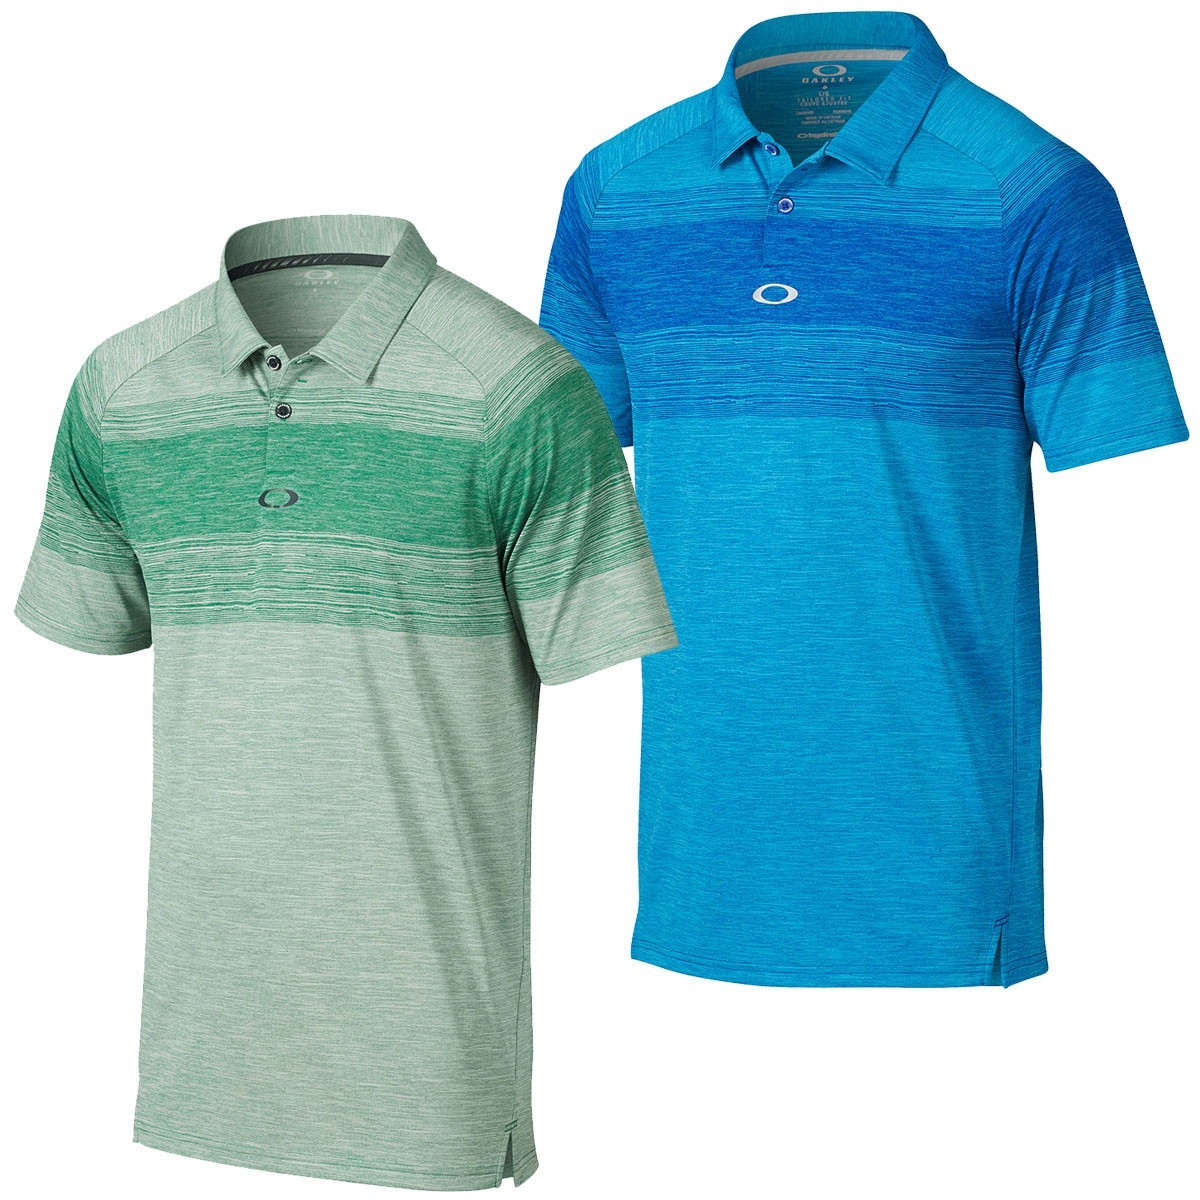 Oakley Golf Shirts Sale Louisiana Bucket Brigade